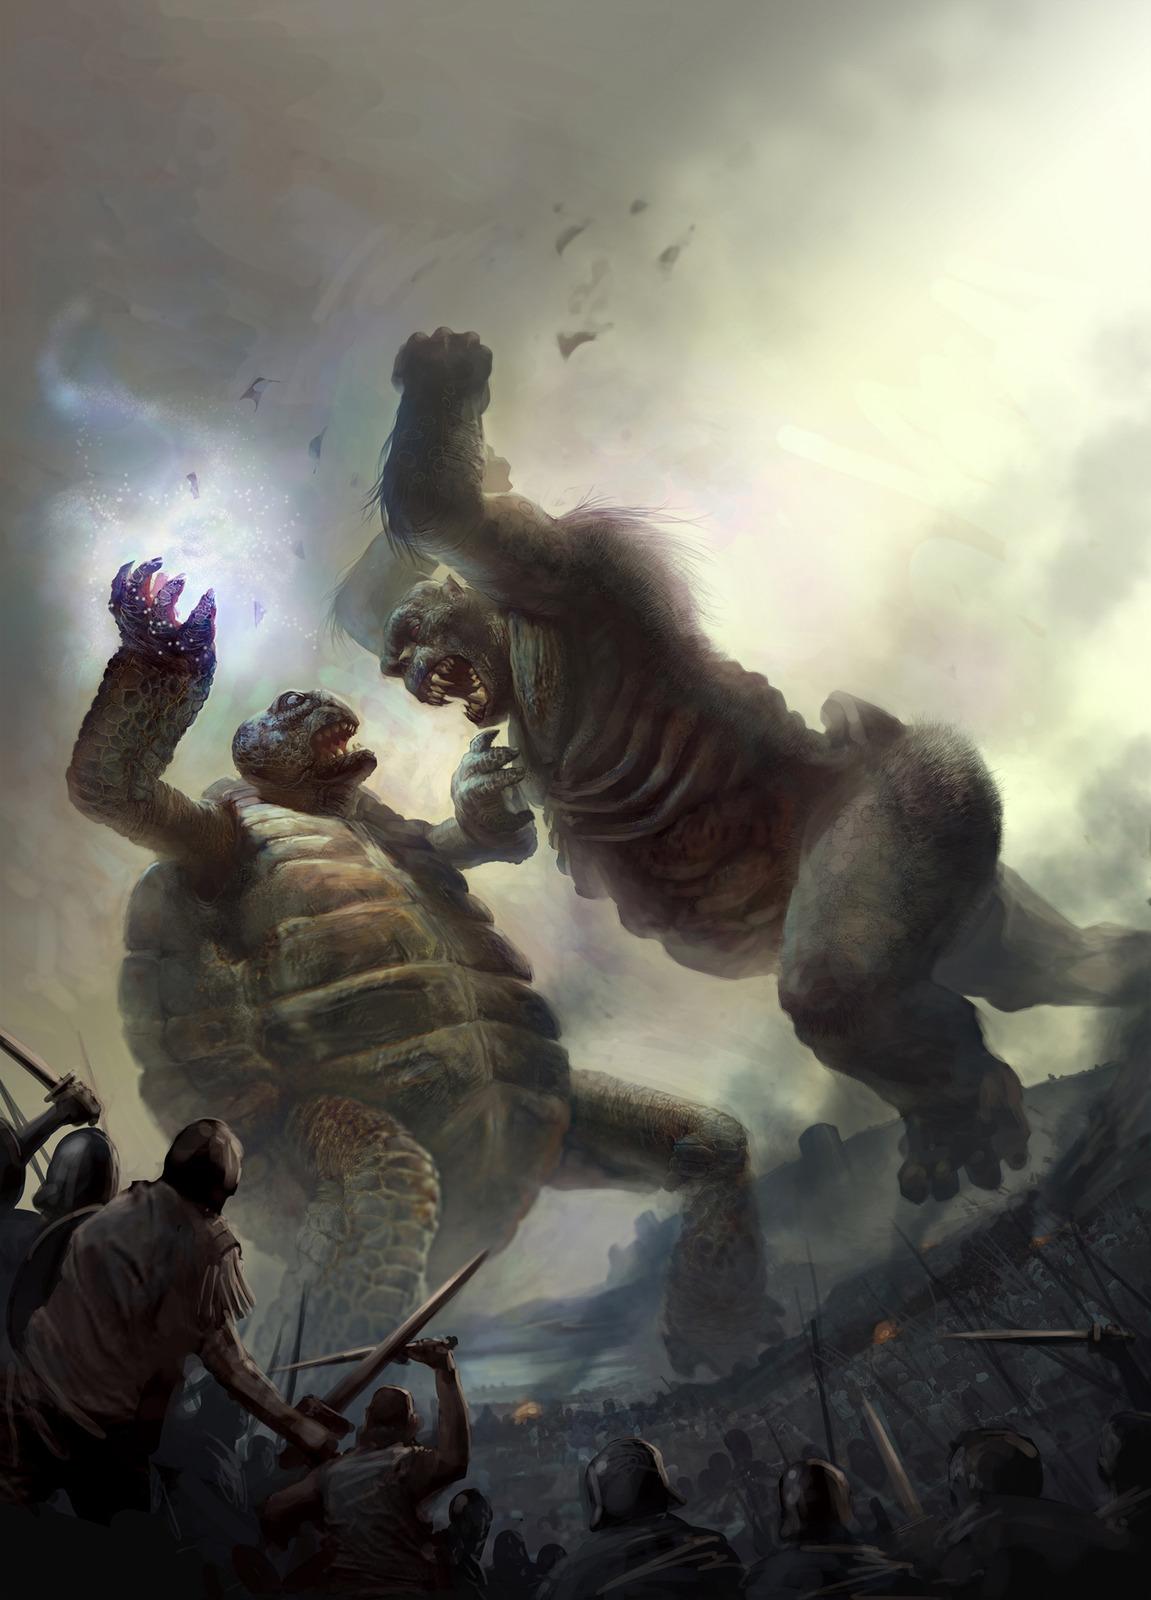 Ps3 Animated Wallpaper Giant Zombie Ape Battles Giant Tortoise In Geek Art